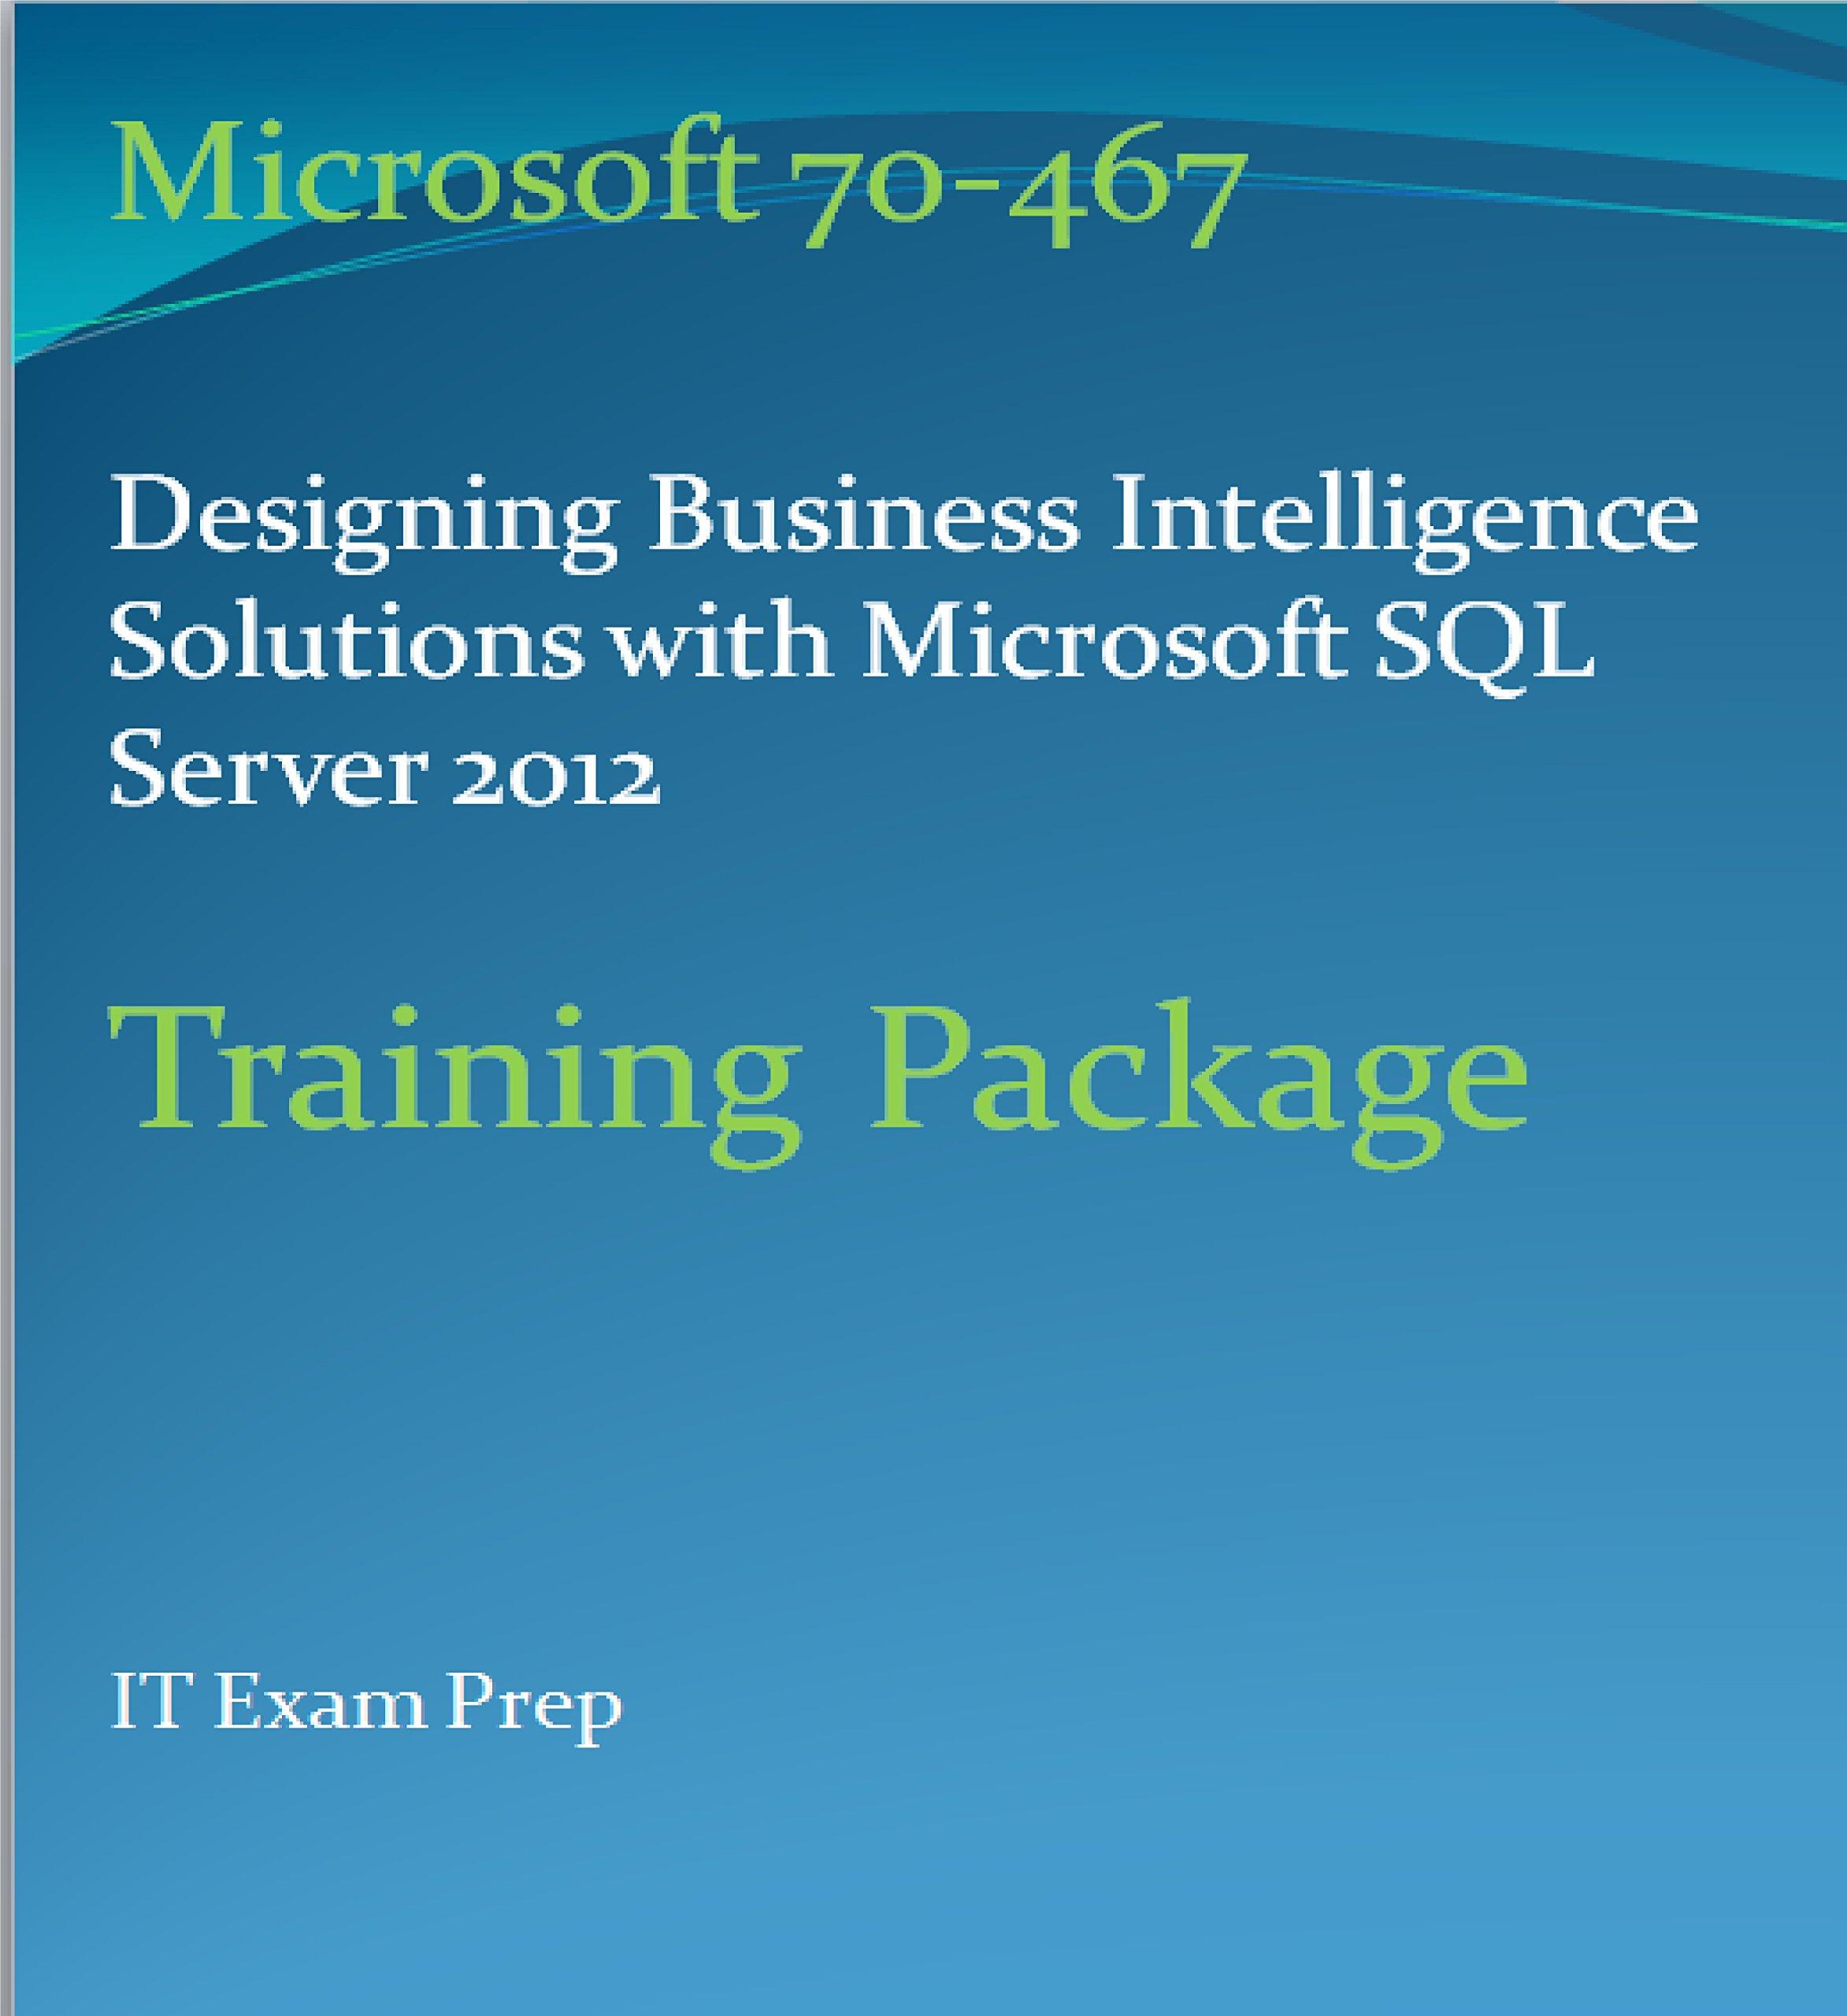 Microsoft Sql 2012 Bi Mcse Exam Package 70 467 Designing Business